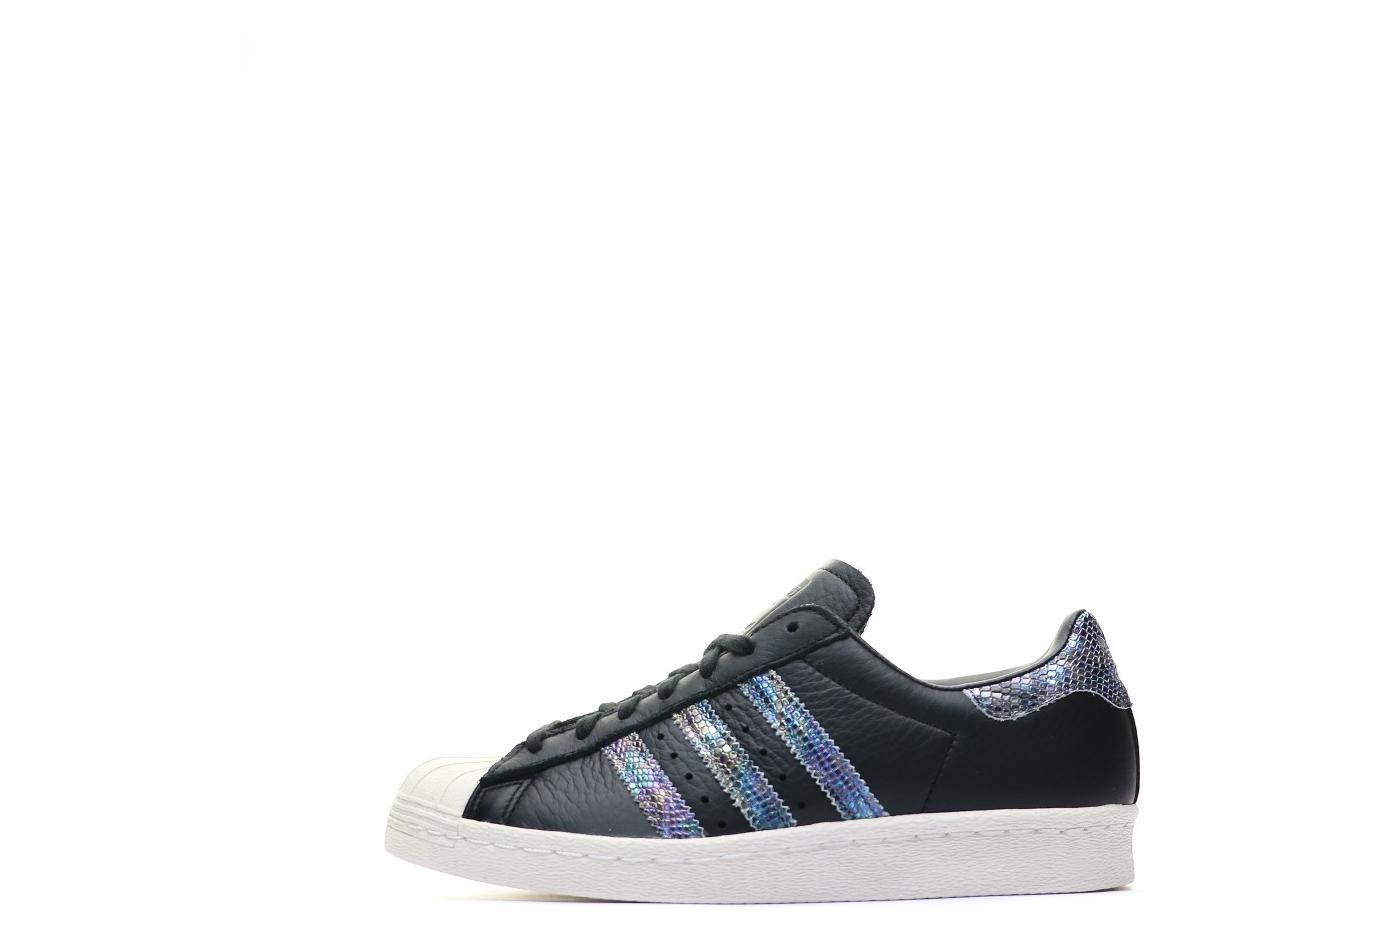 meilleur service fa7ad 5cc83 Superstar 80s Chaussures Noir Femme Adidas